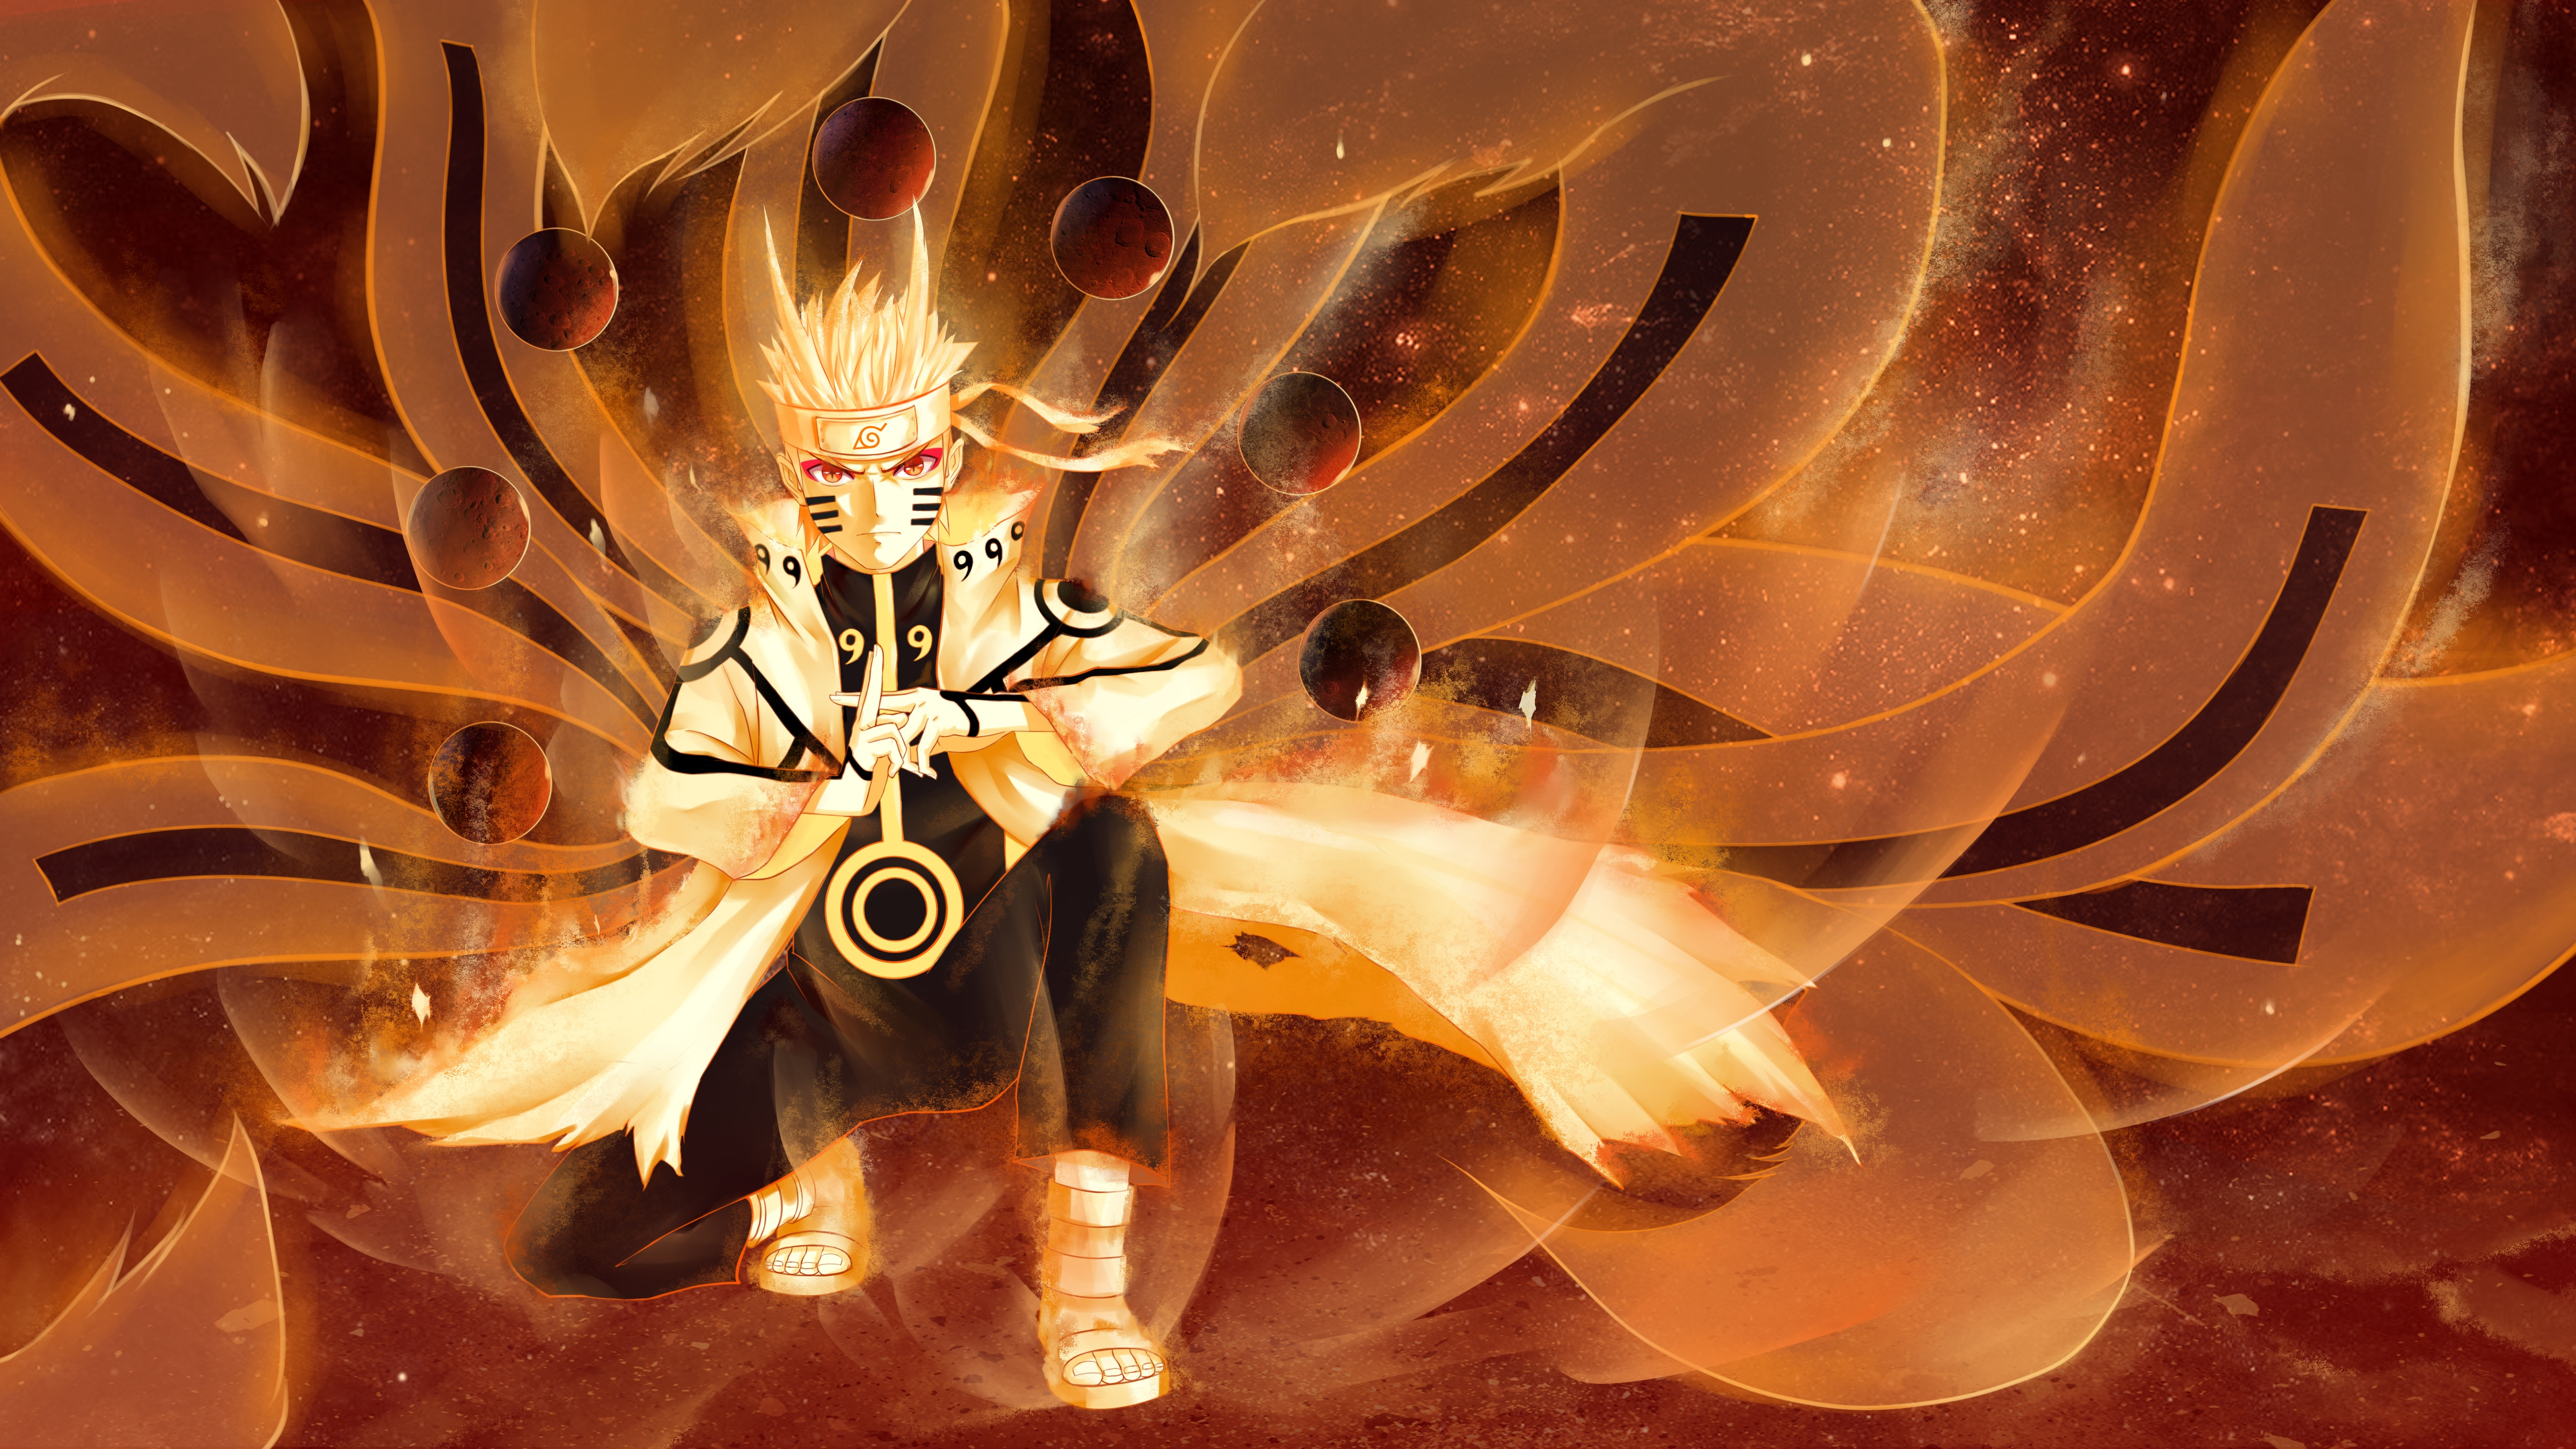 Naruto 4k Ultra HD Wallpaper | Background Image ...